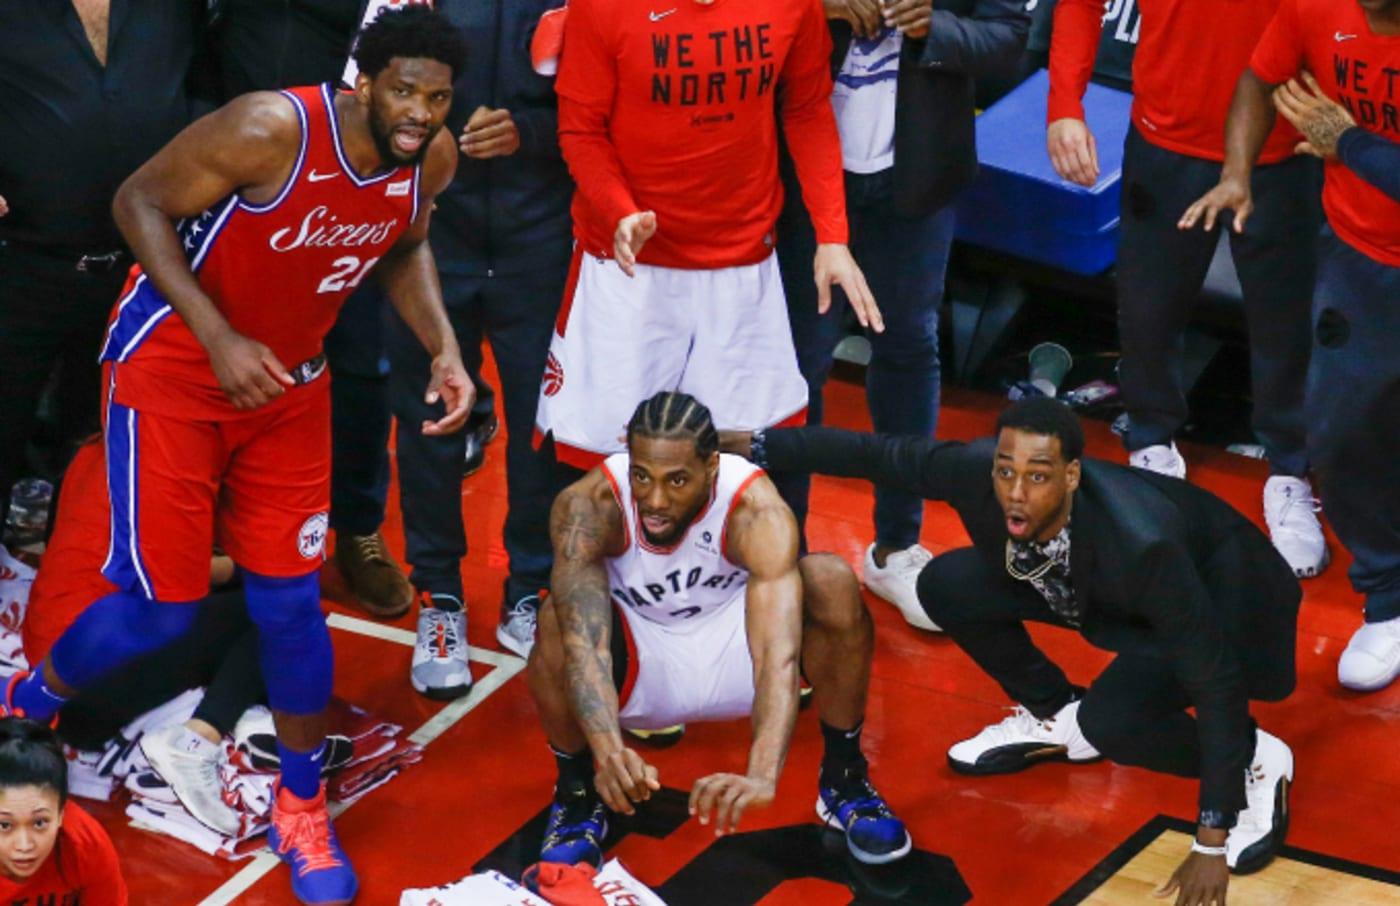 Raptors forward Kawhi Leonard (2) squats down